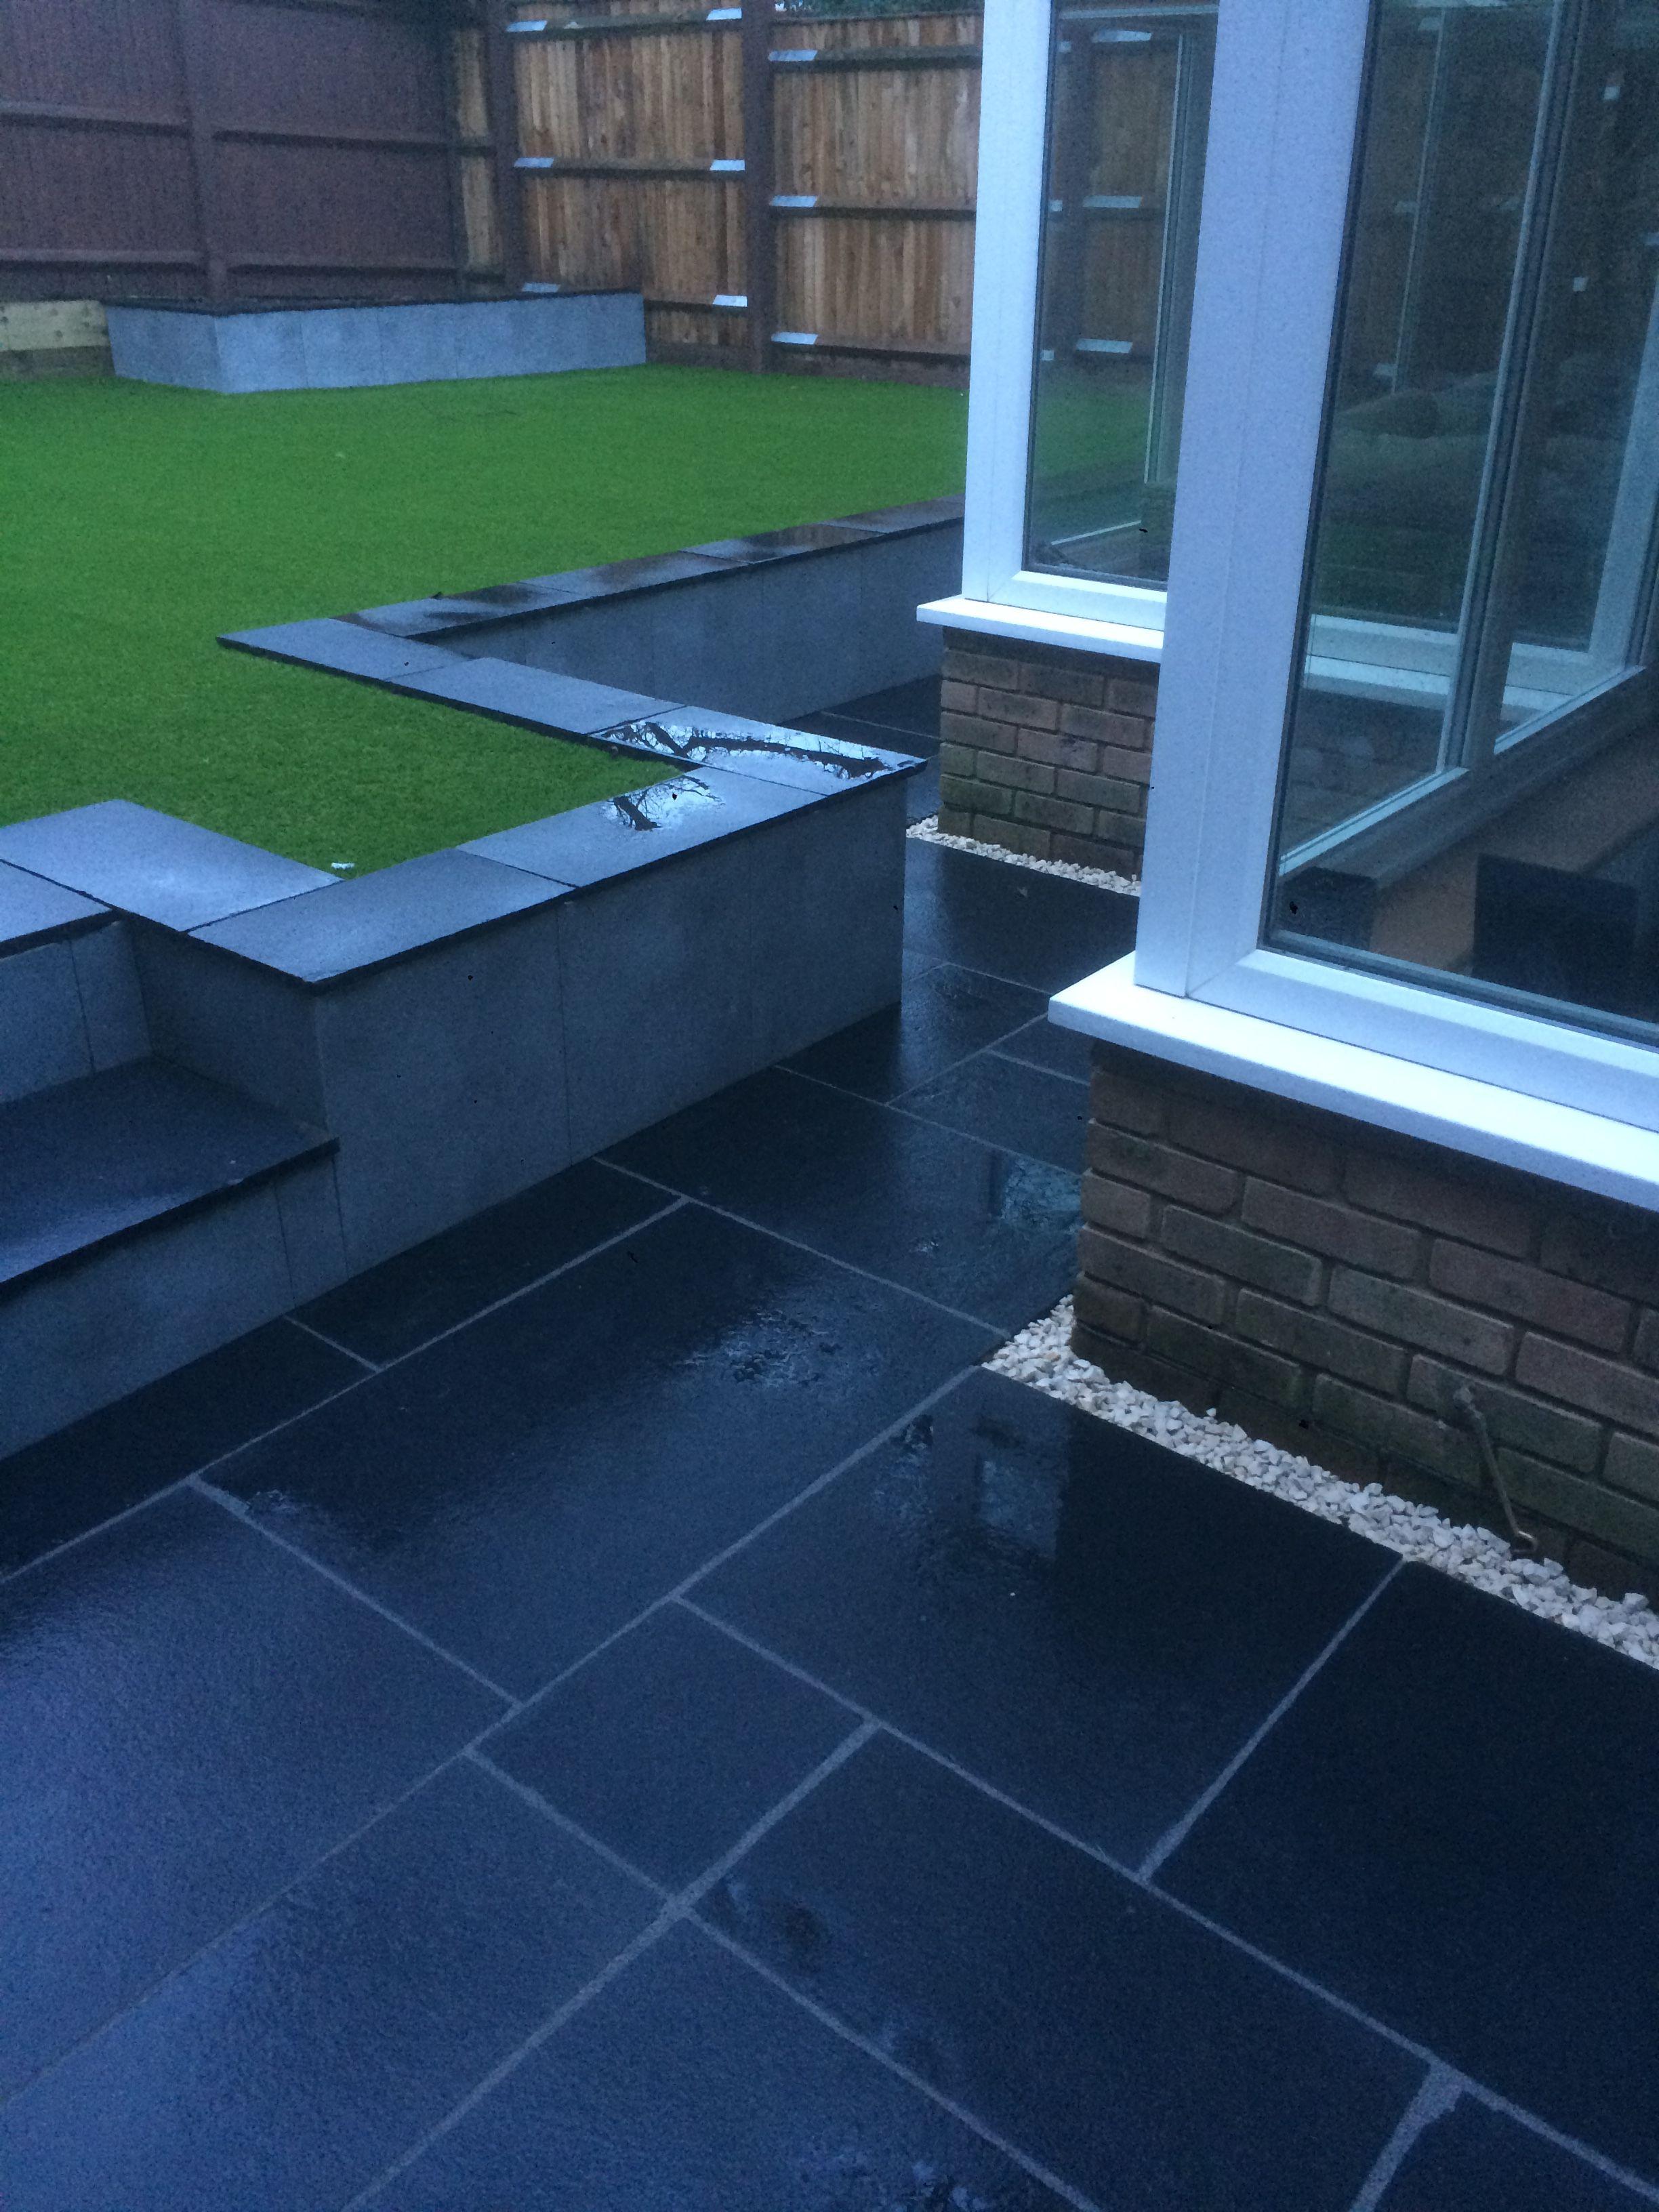 Black Stone Patio And Garden Design Ideas For Small To Medium